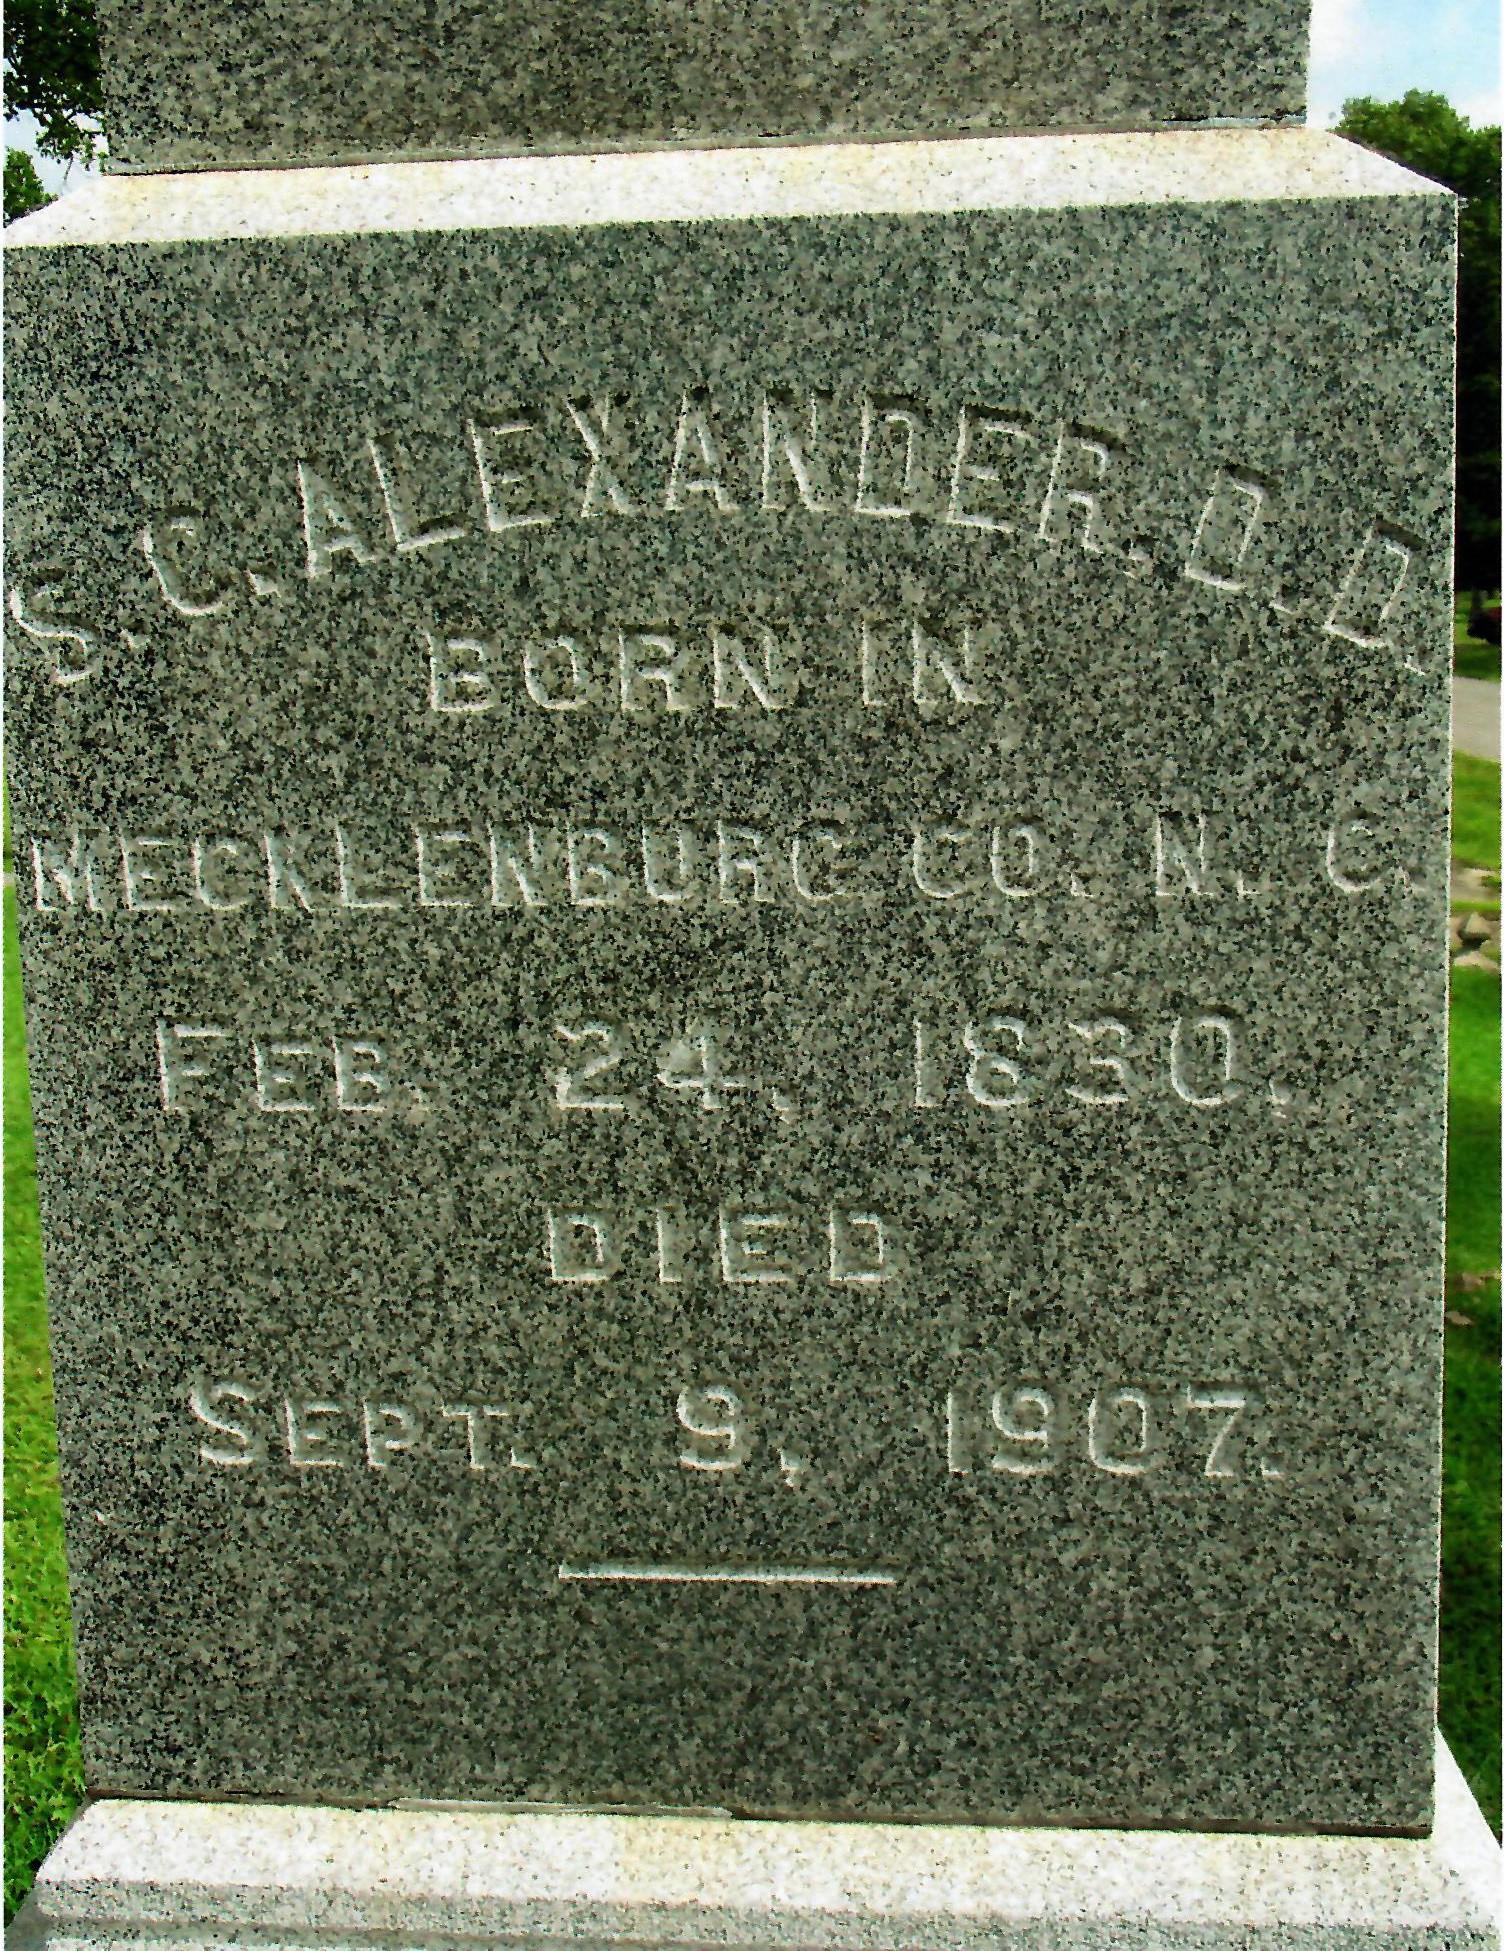 Samuel Caldwell Alexander, Sr. is buried at Bellwood Cemetery, Pine Bluff, Arkansas.